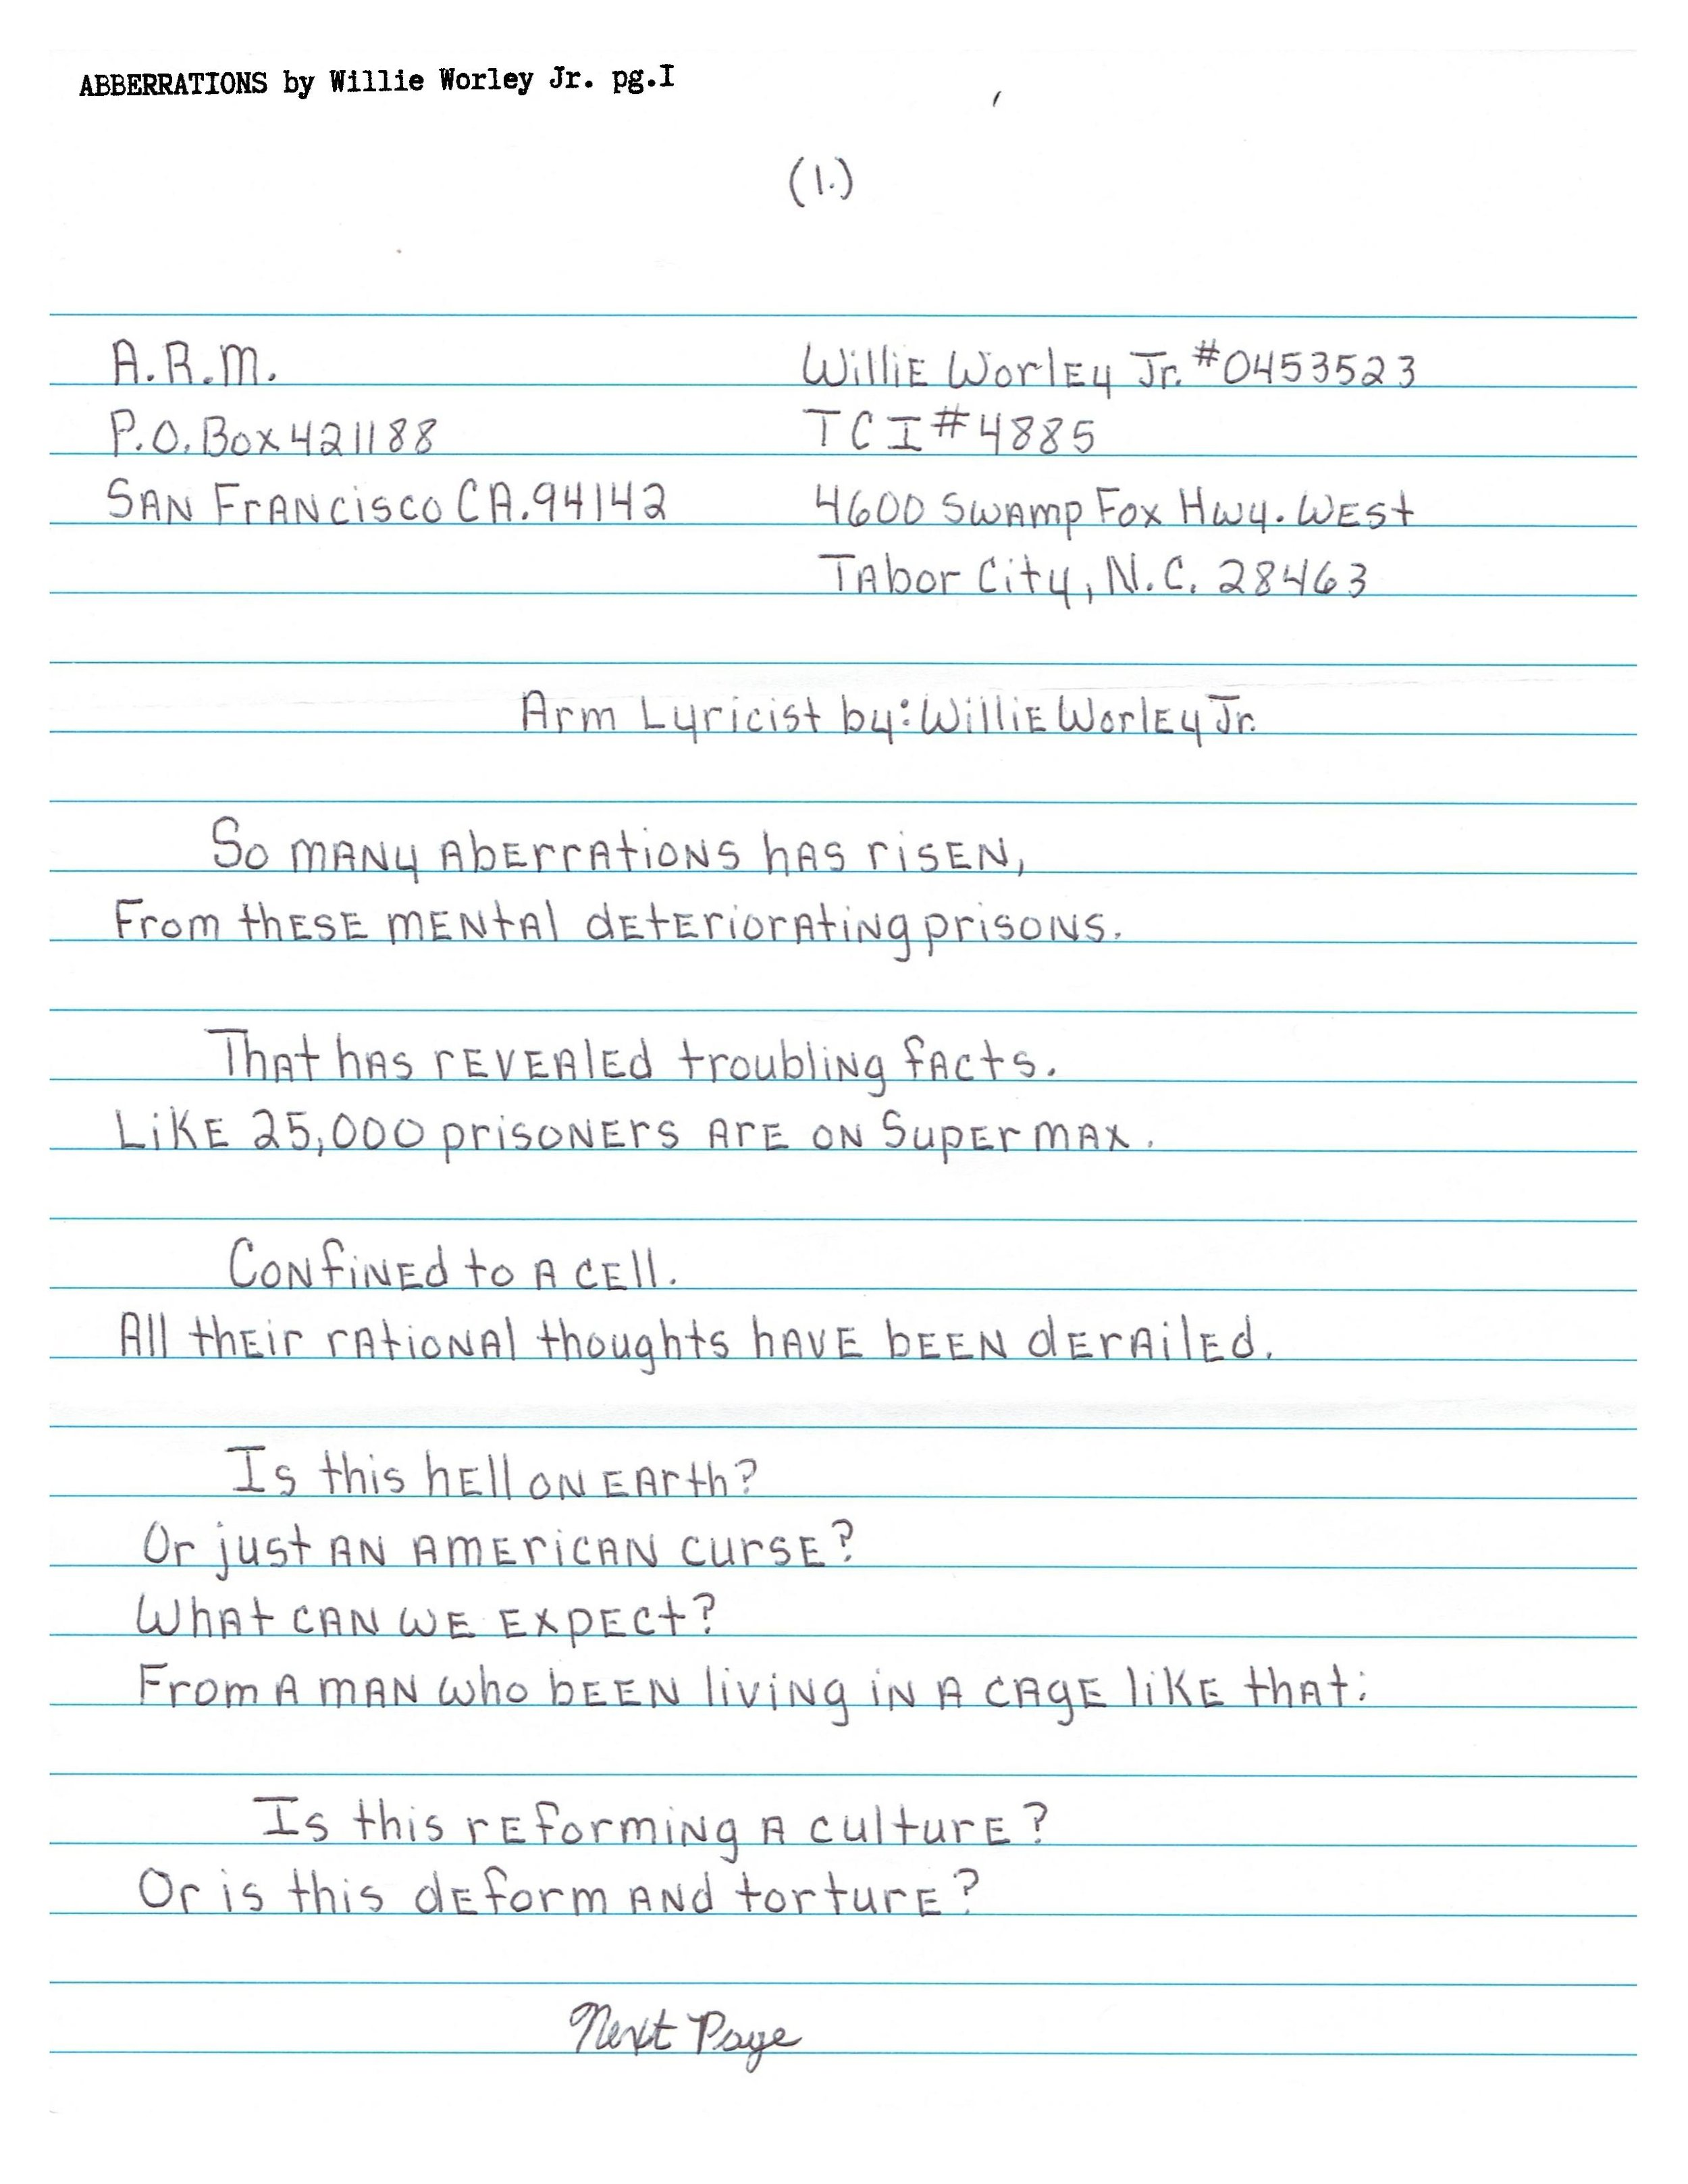 SLFH_vol_1-page-013.jpg